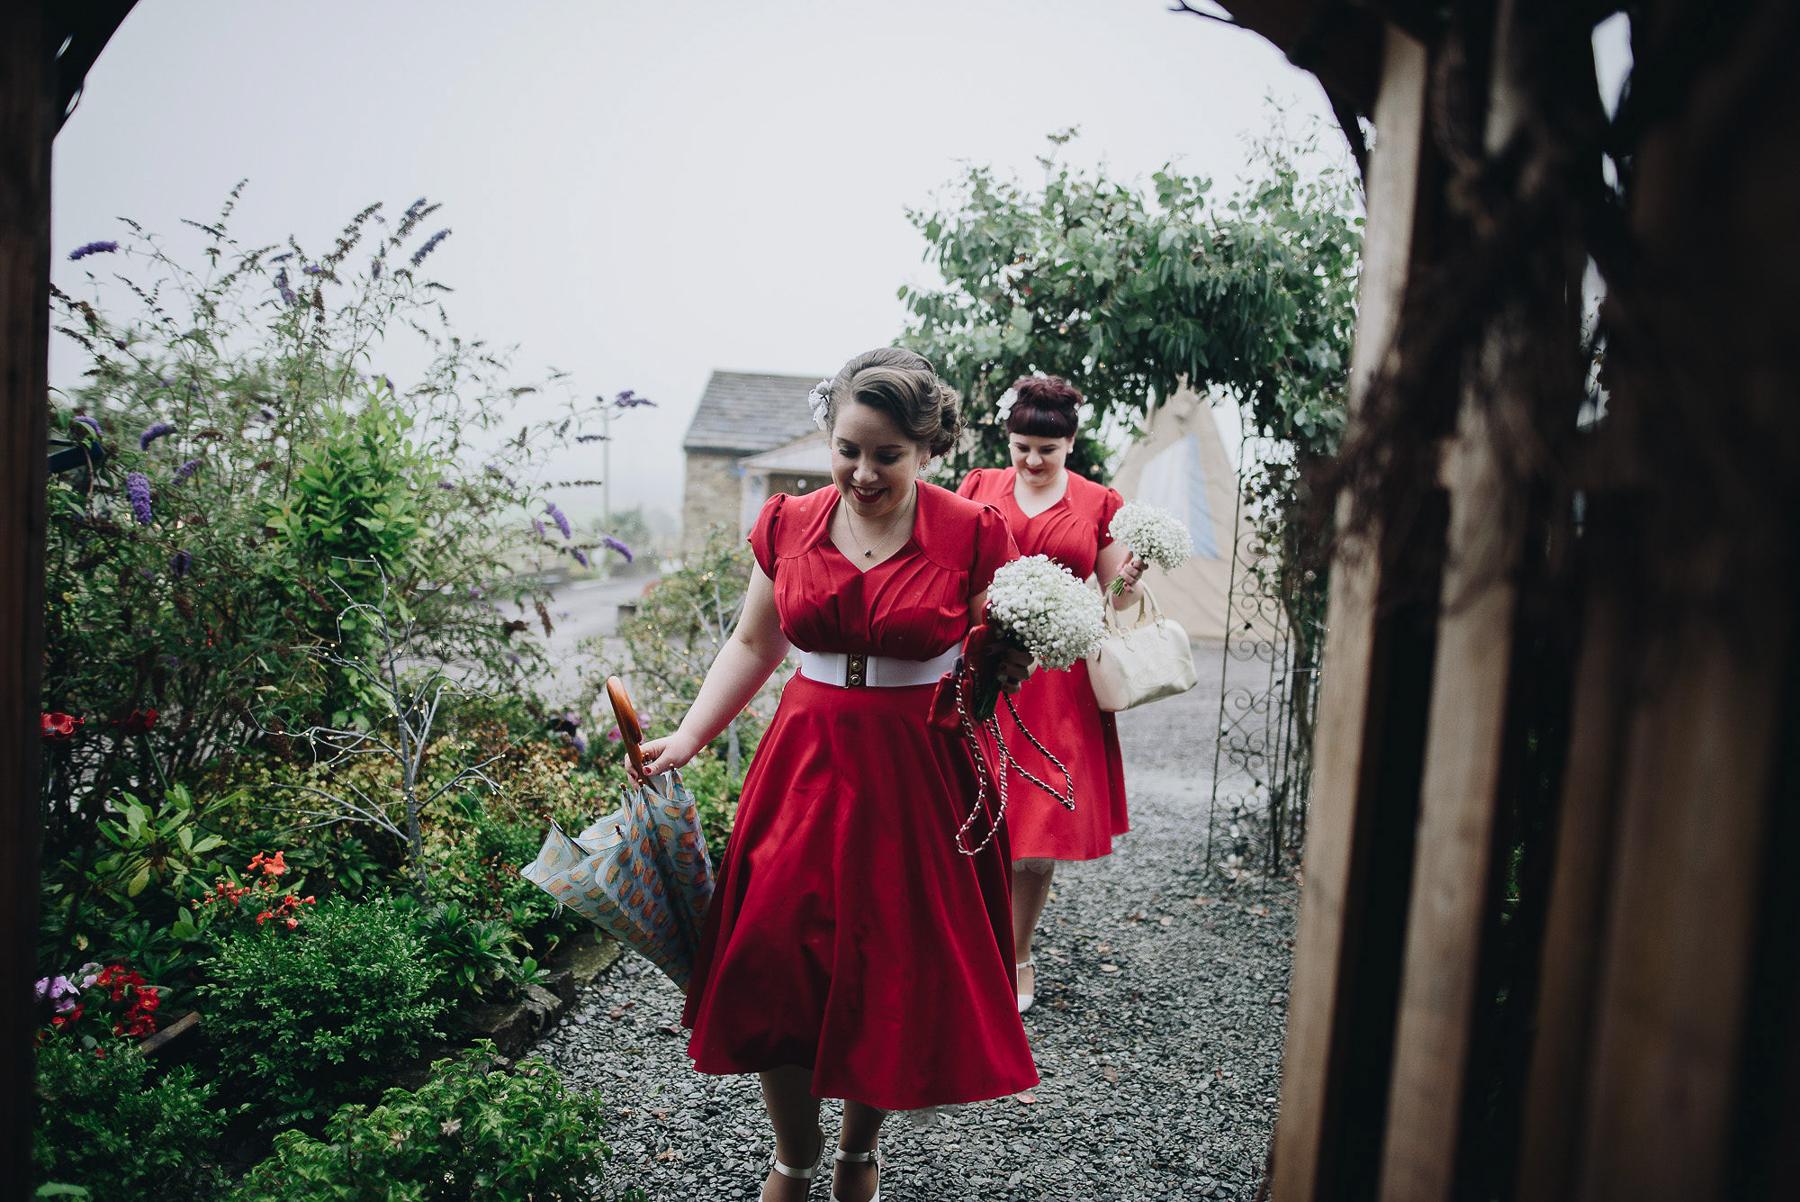 Wellbeing_Farm_Wedding_Photography_The_Pin-Up_Bride_Lara_Shaun-40.jpg